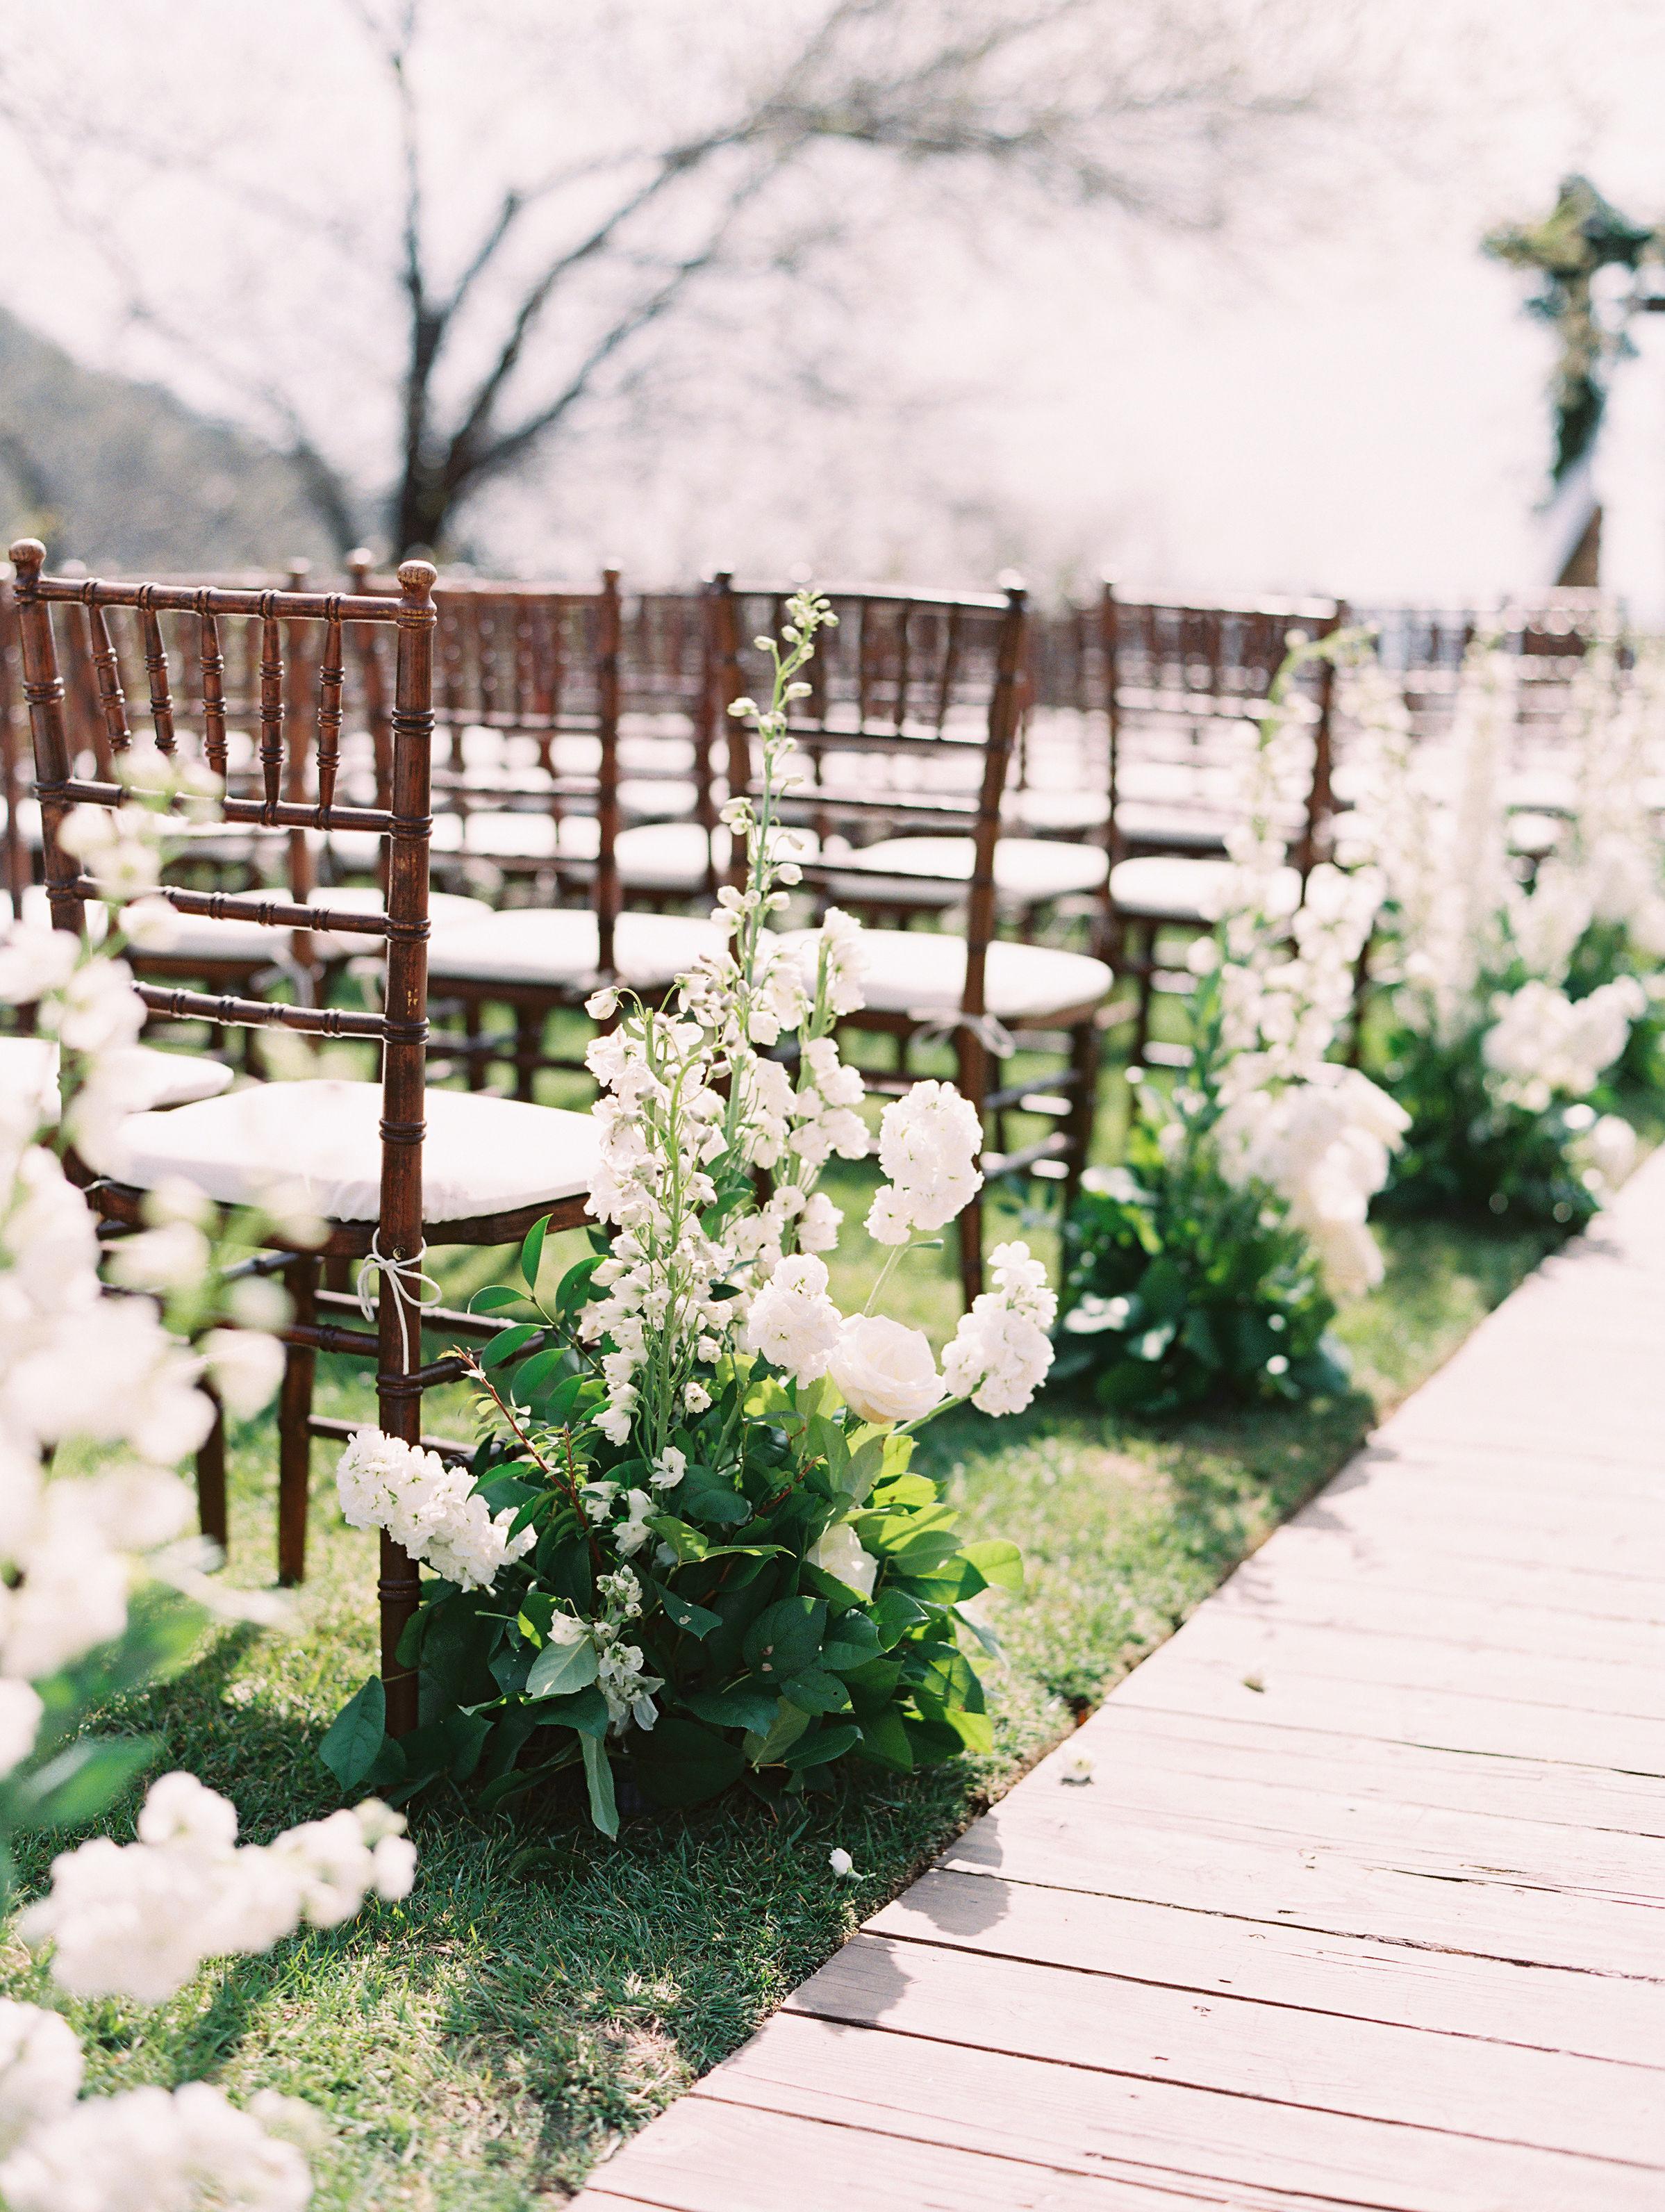 Jenny-Quicksall-Photography-serendipity-gardens-32.jpg